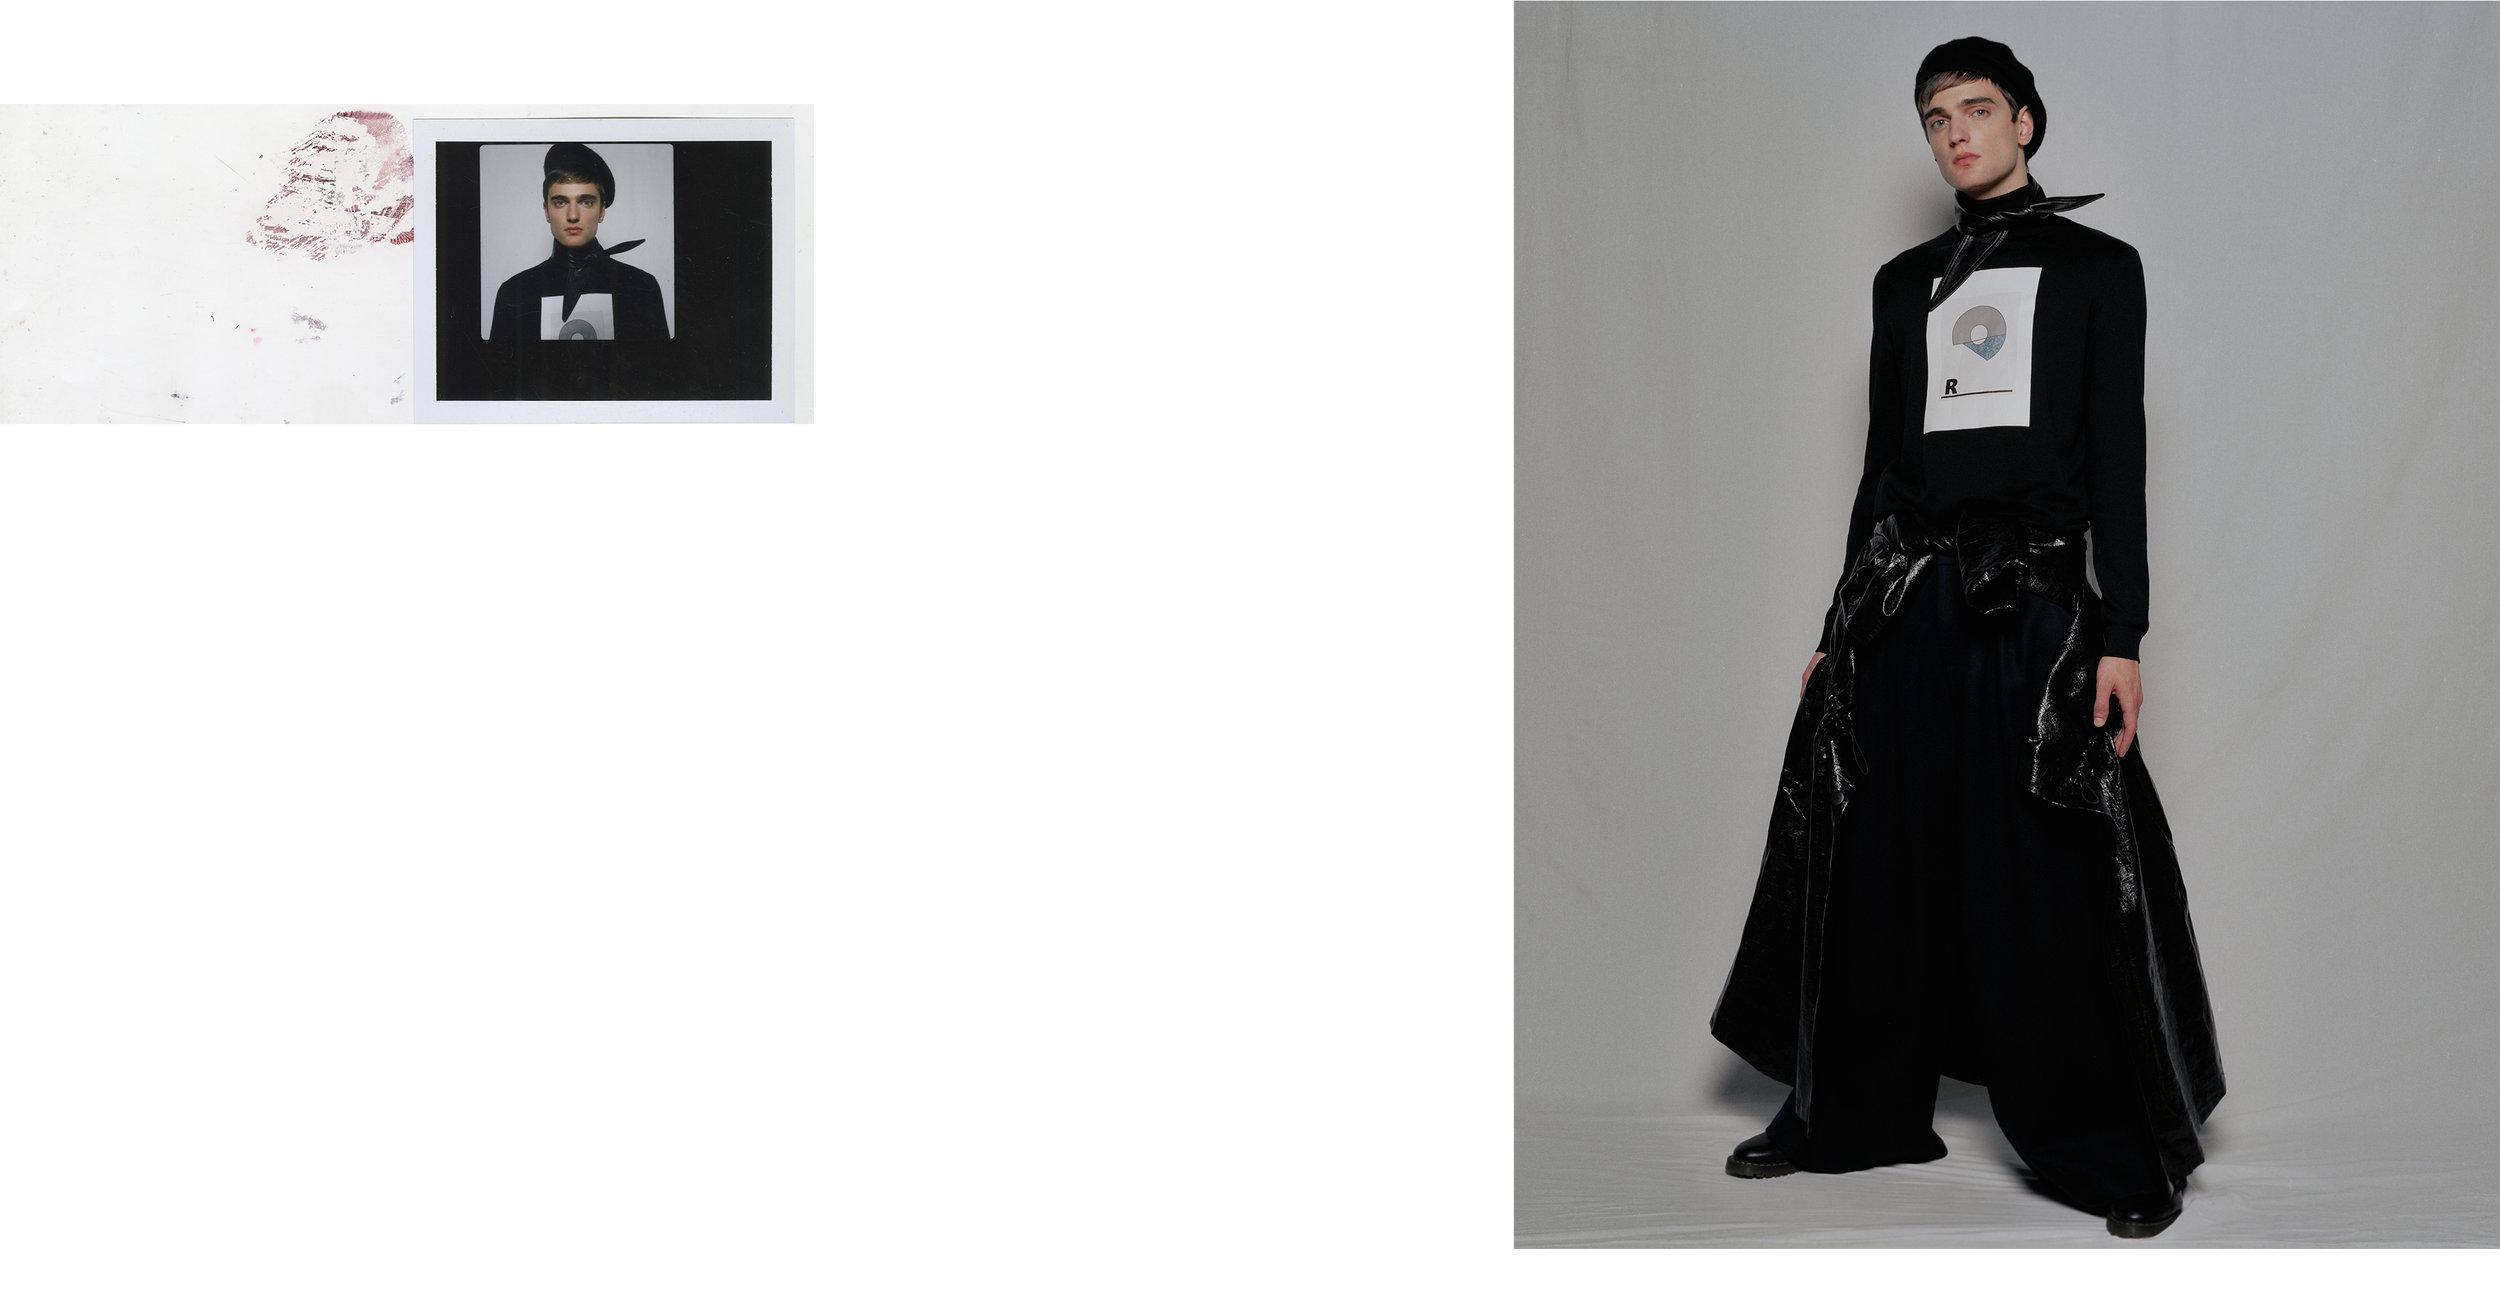 sweater + pant + jacket RAUN LAROSE,necktie ORSEUND IRIS, beret STYLIST'S OWN, shoes DOC MARTENS